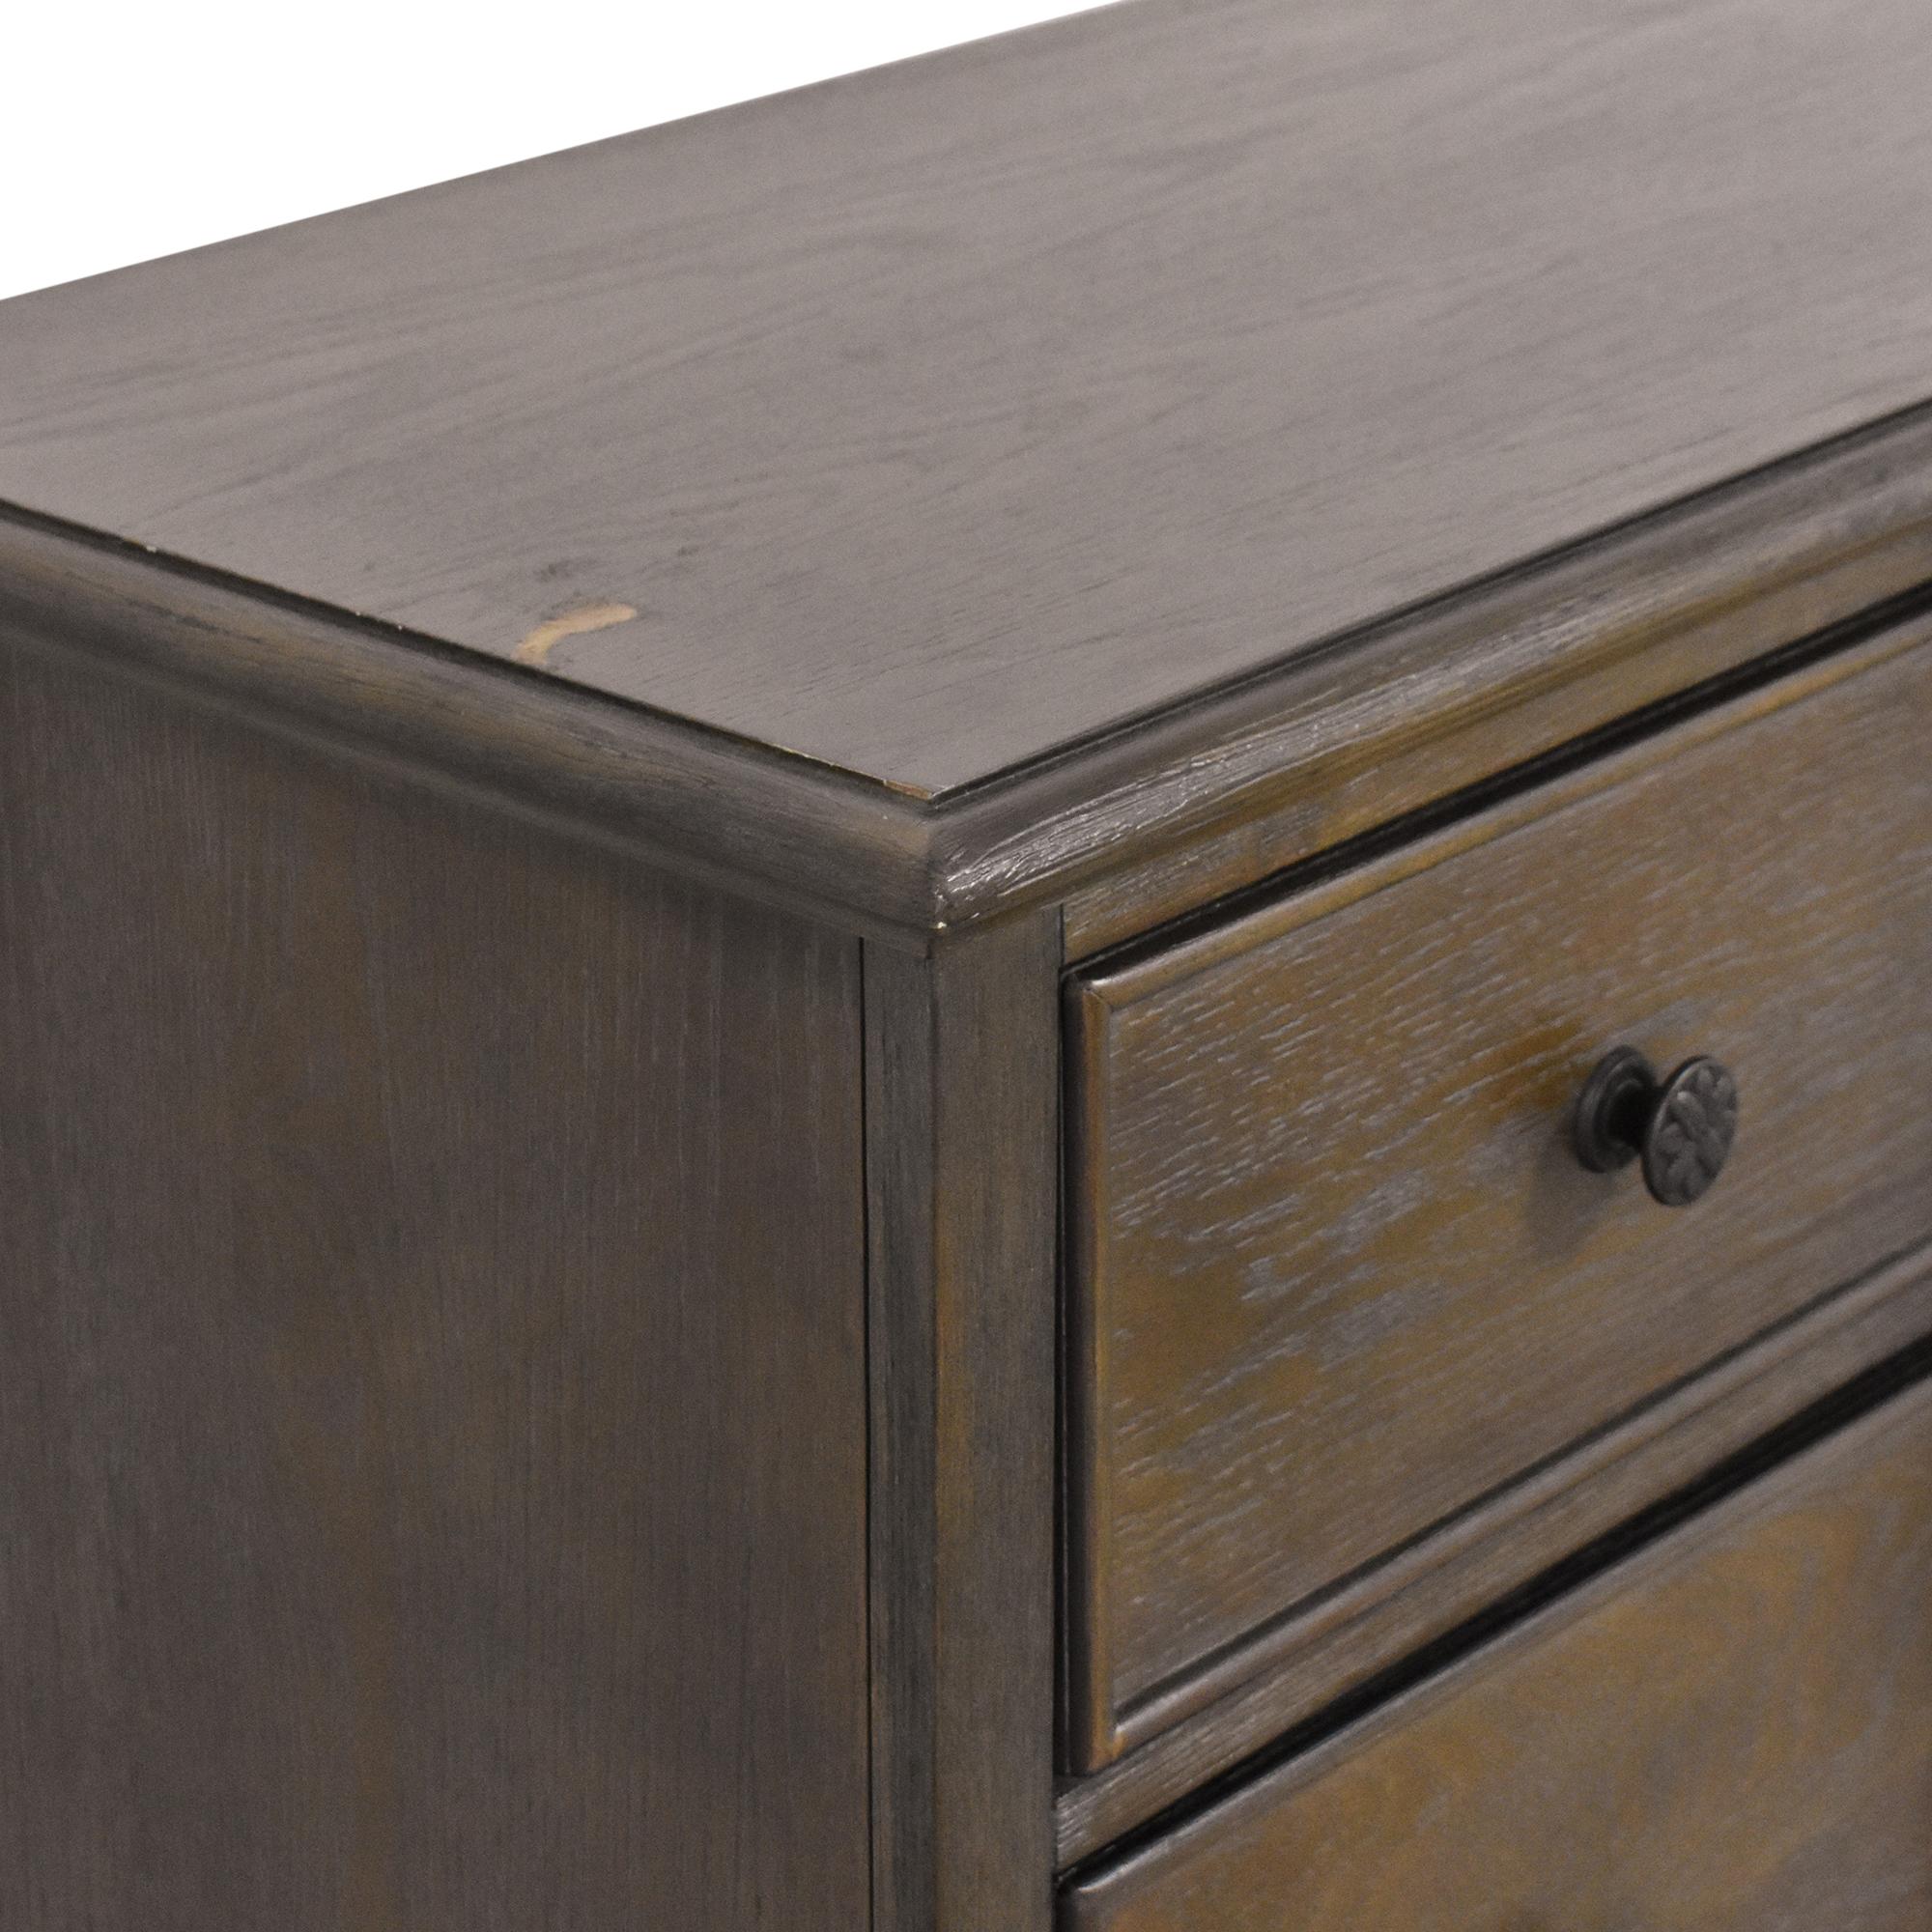 Acme Acme Baudouin Nine Drawer Dresser for sale